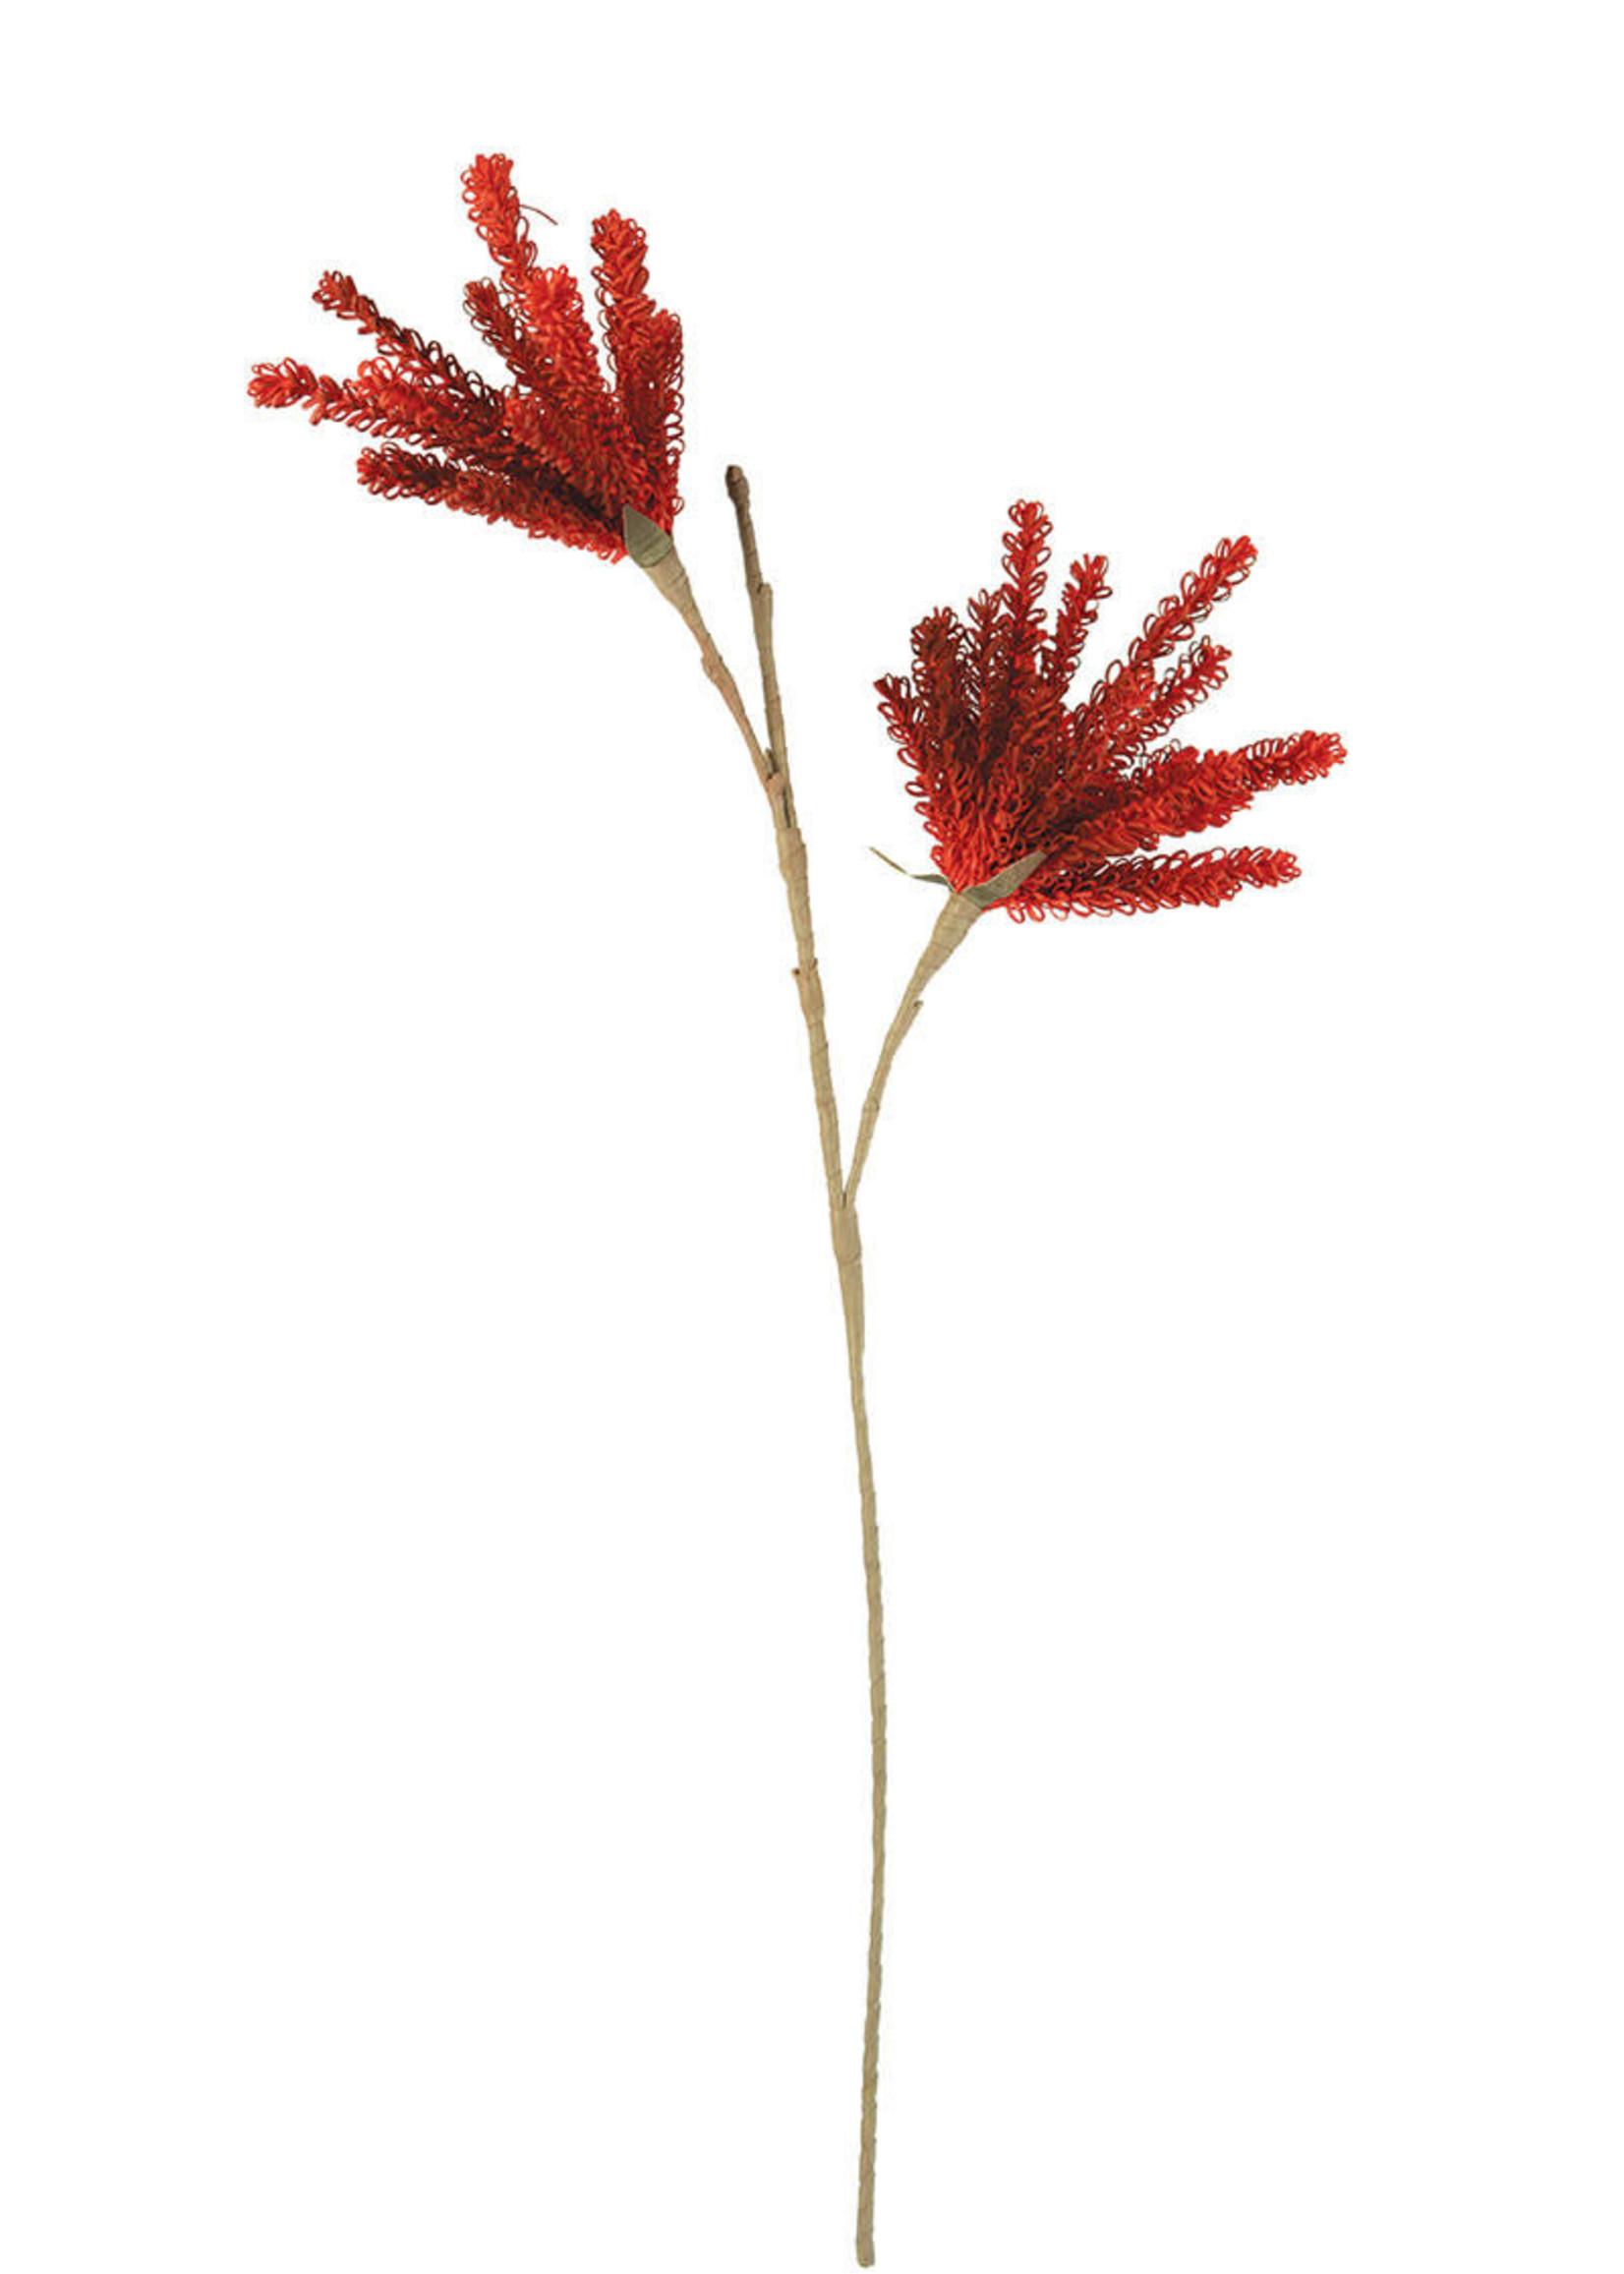 Botanica #3163